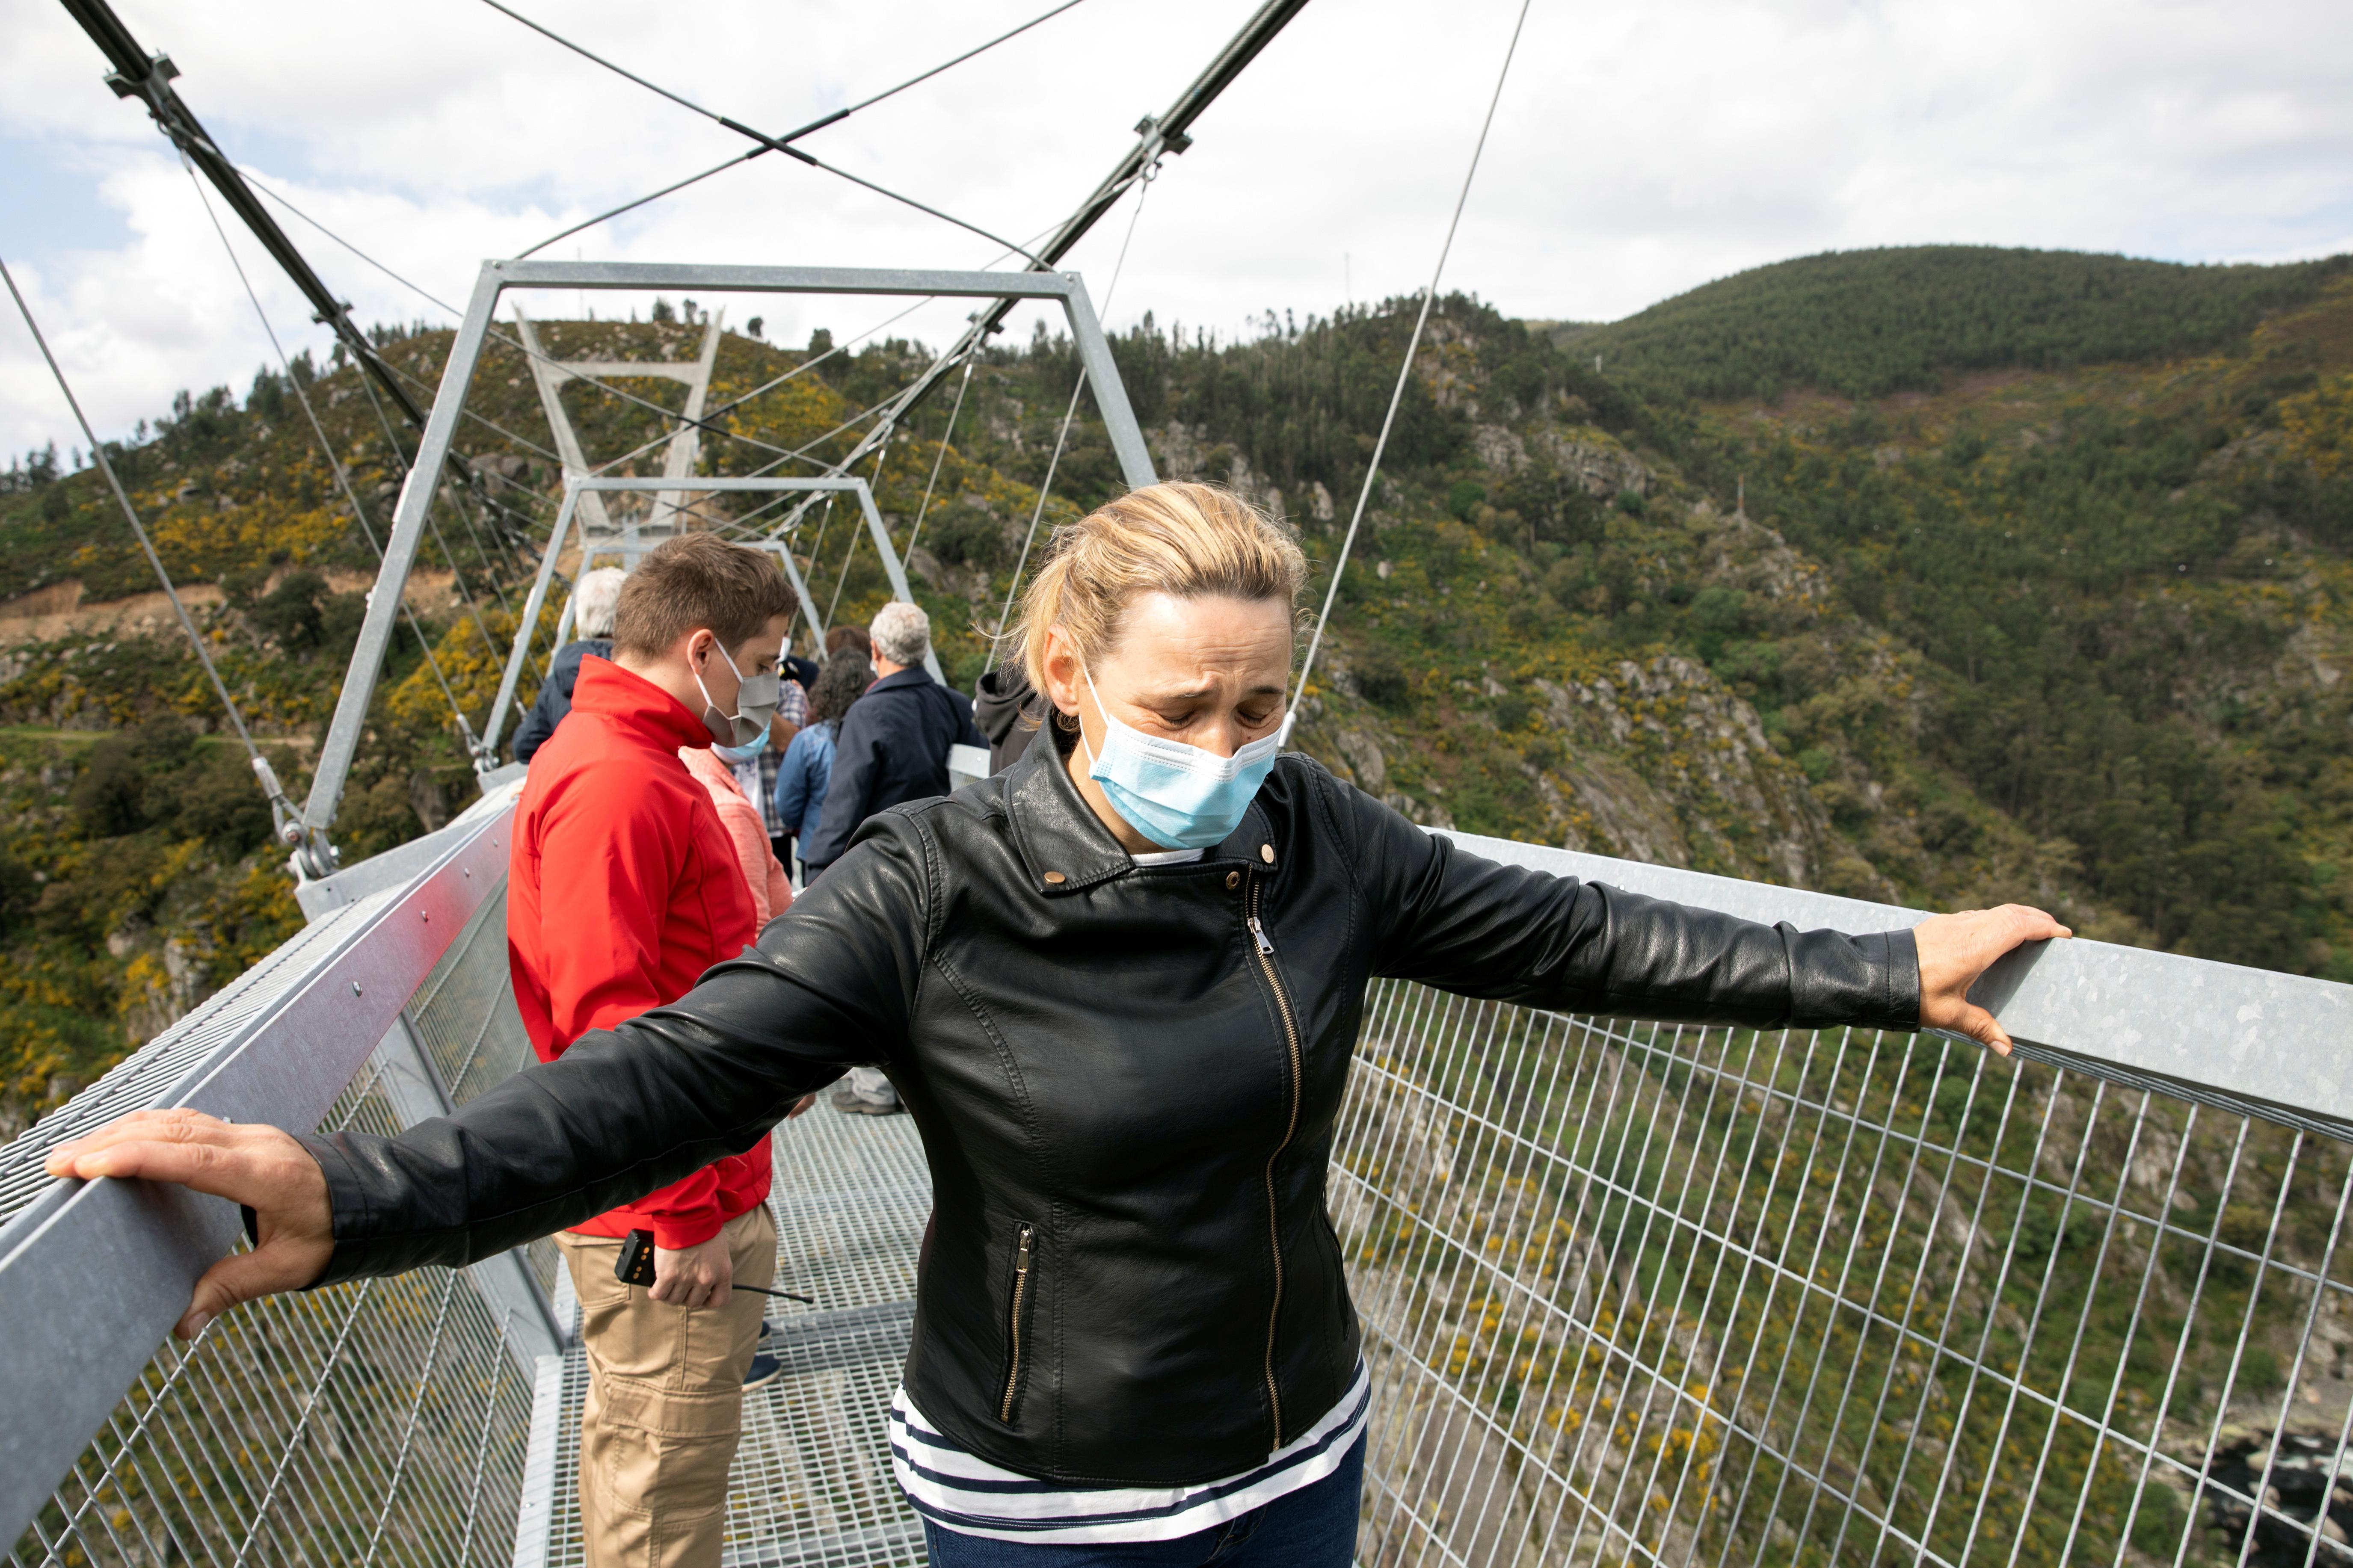 People walk on the world's longest pedestrian suspension bridge '516 Arouca', now open for local residents in Arouca, Portugal, April 29, 2021. REUTERS/Violeta Santos Moura